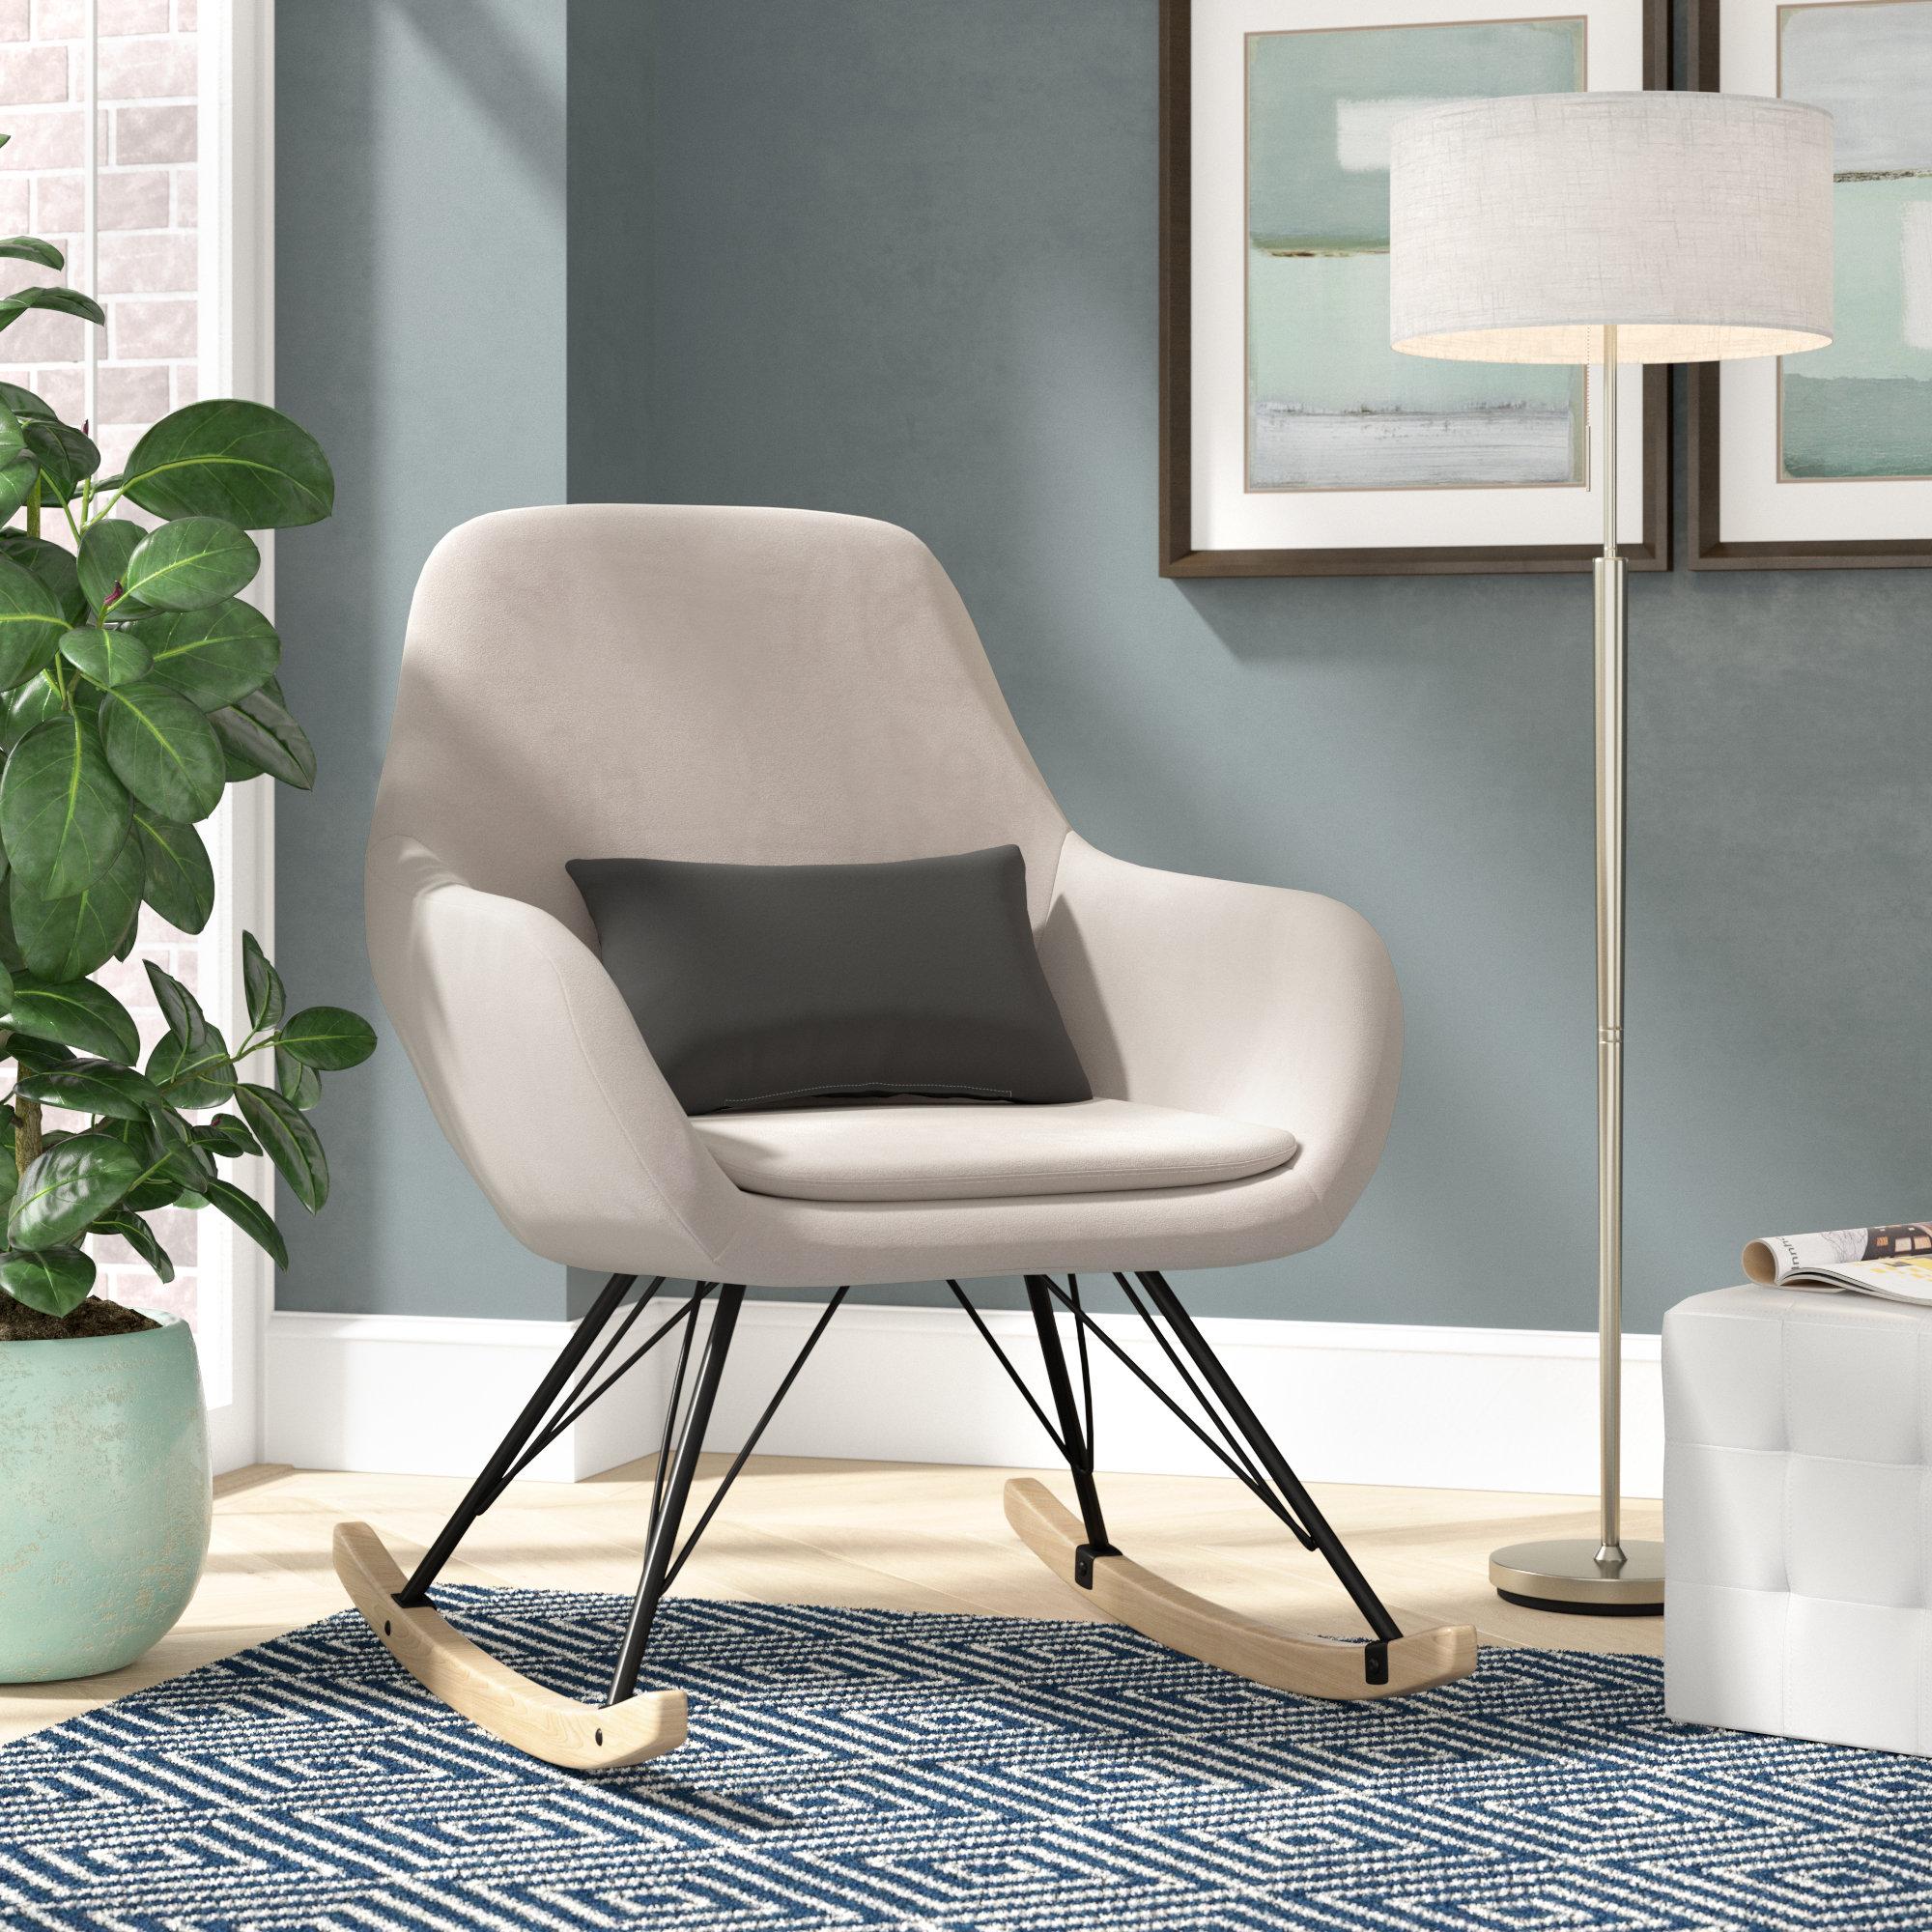 Brayden Studio Decker Rocking Chair & Reviews | Wayfair Within Decker Ii Fabric Swivel Glider Recliners (Image 1 of 25)